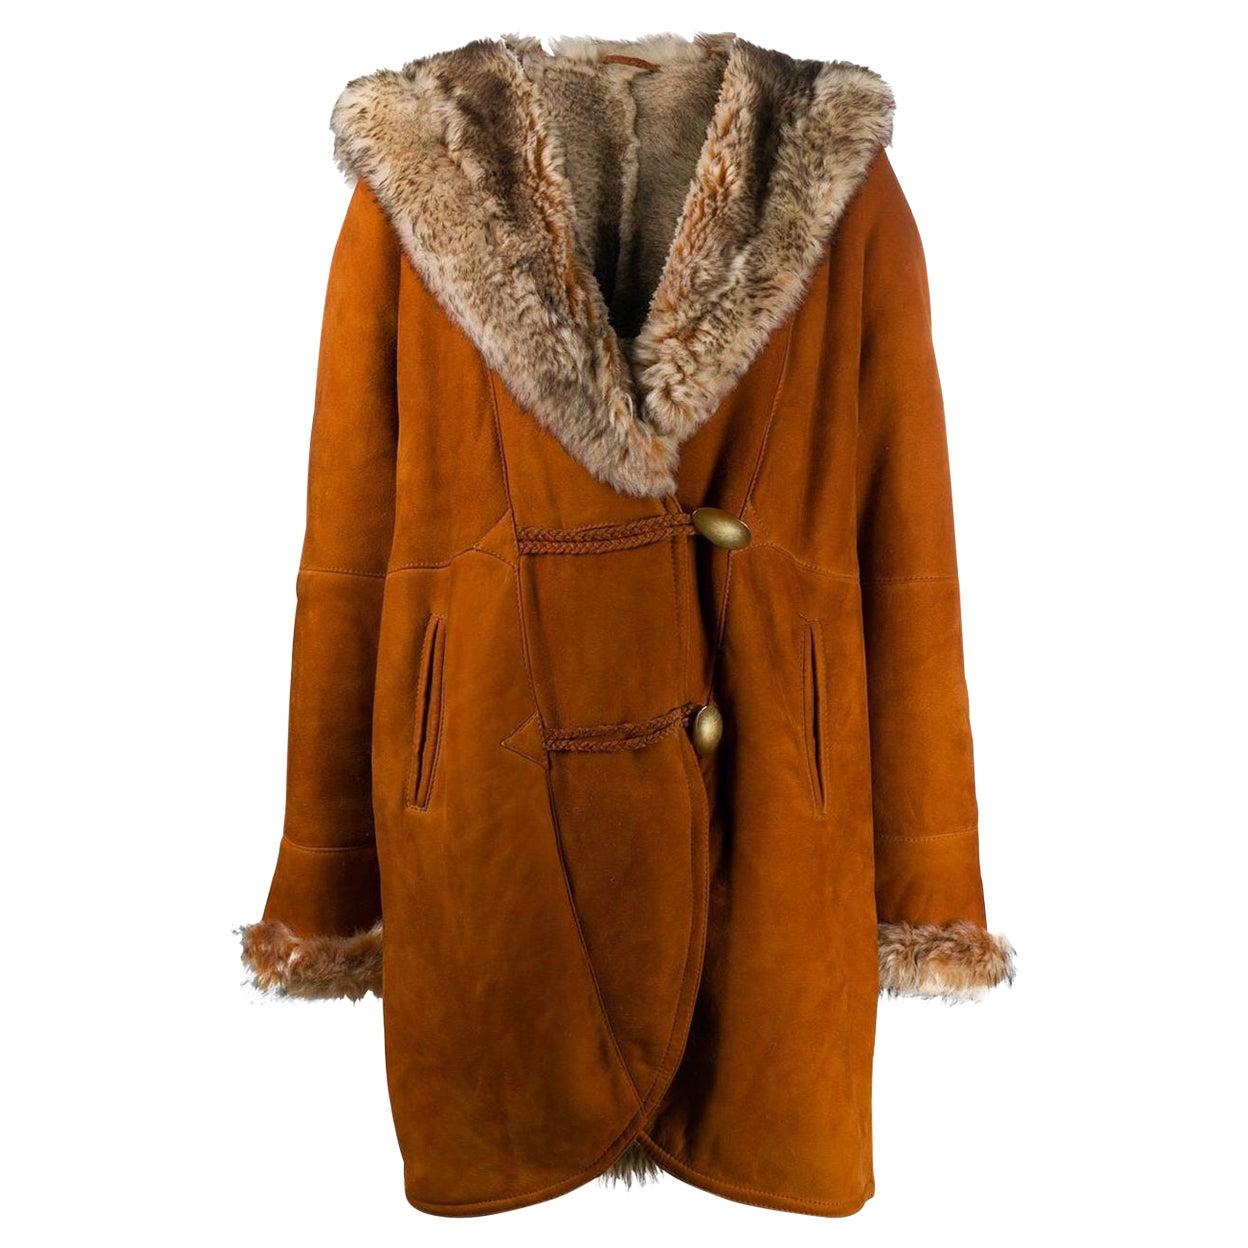 1980s A.N.G.E.L.O. Vintage Cult Hooded Coat